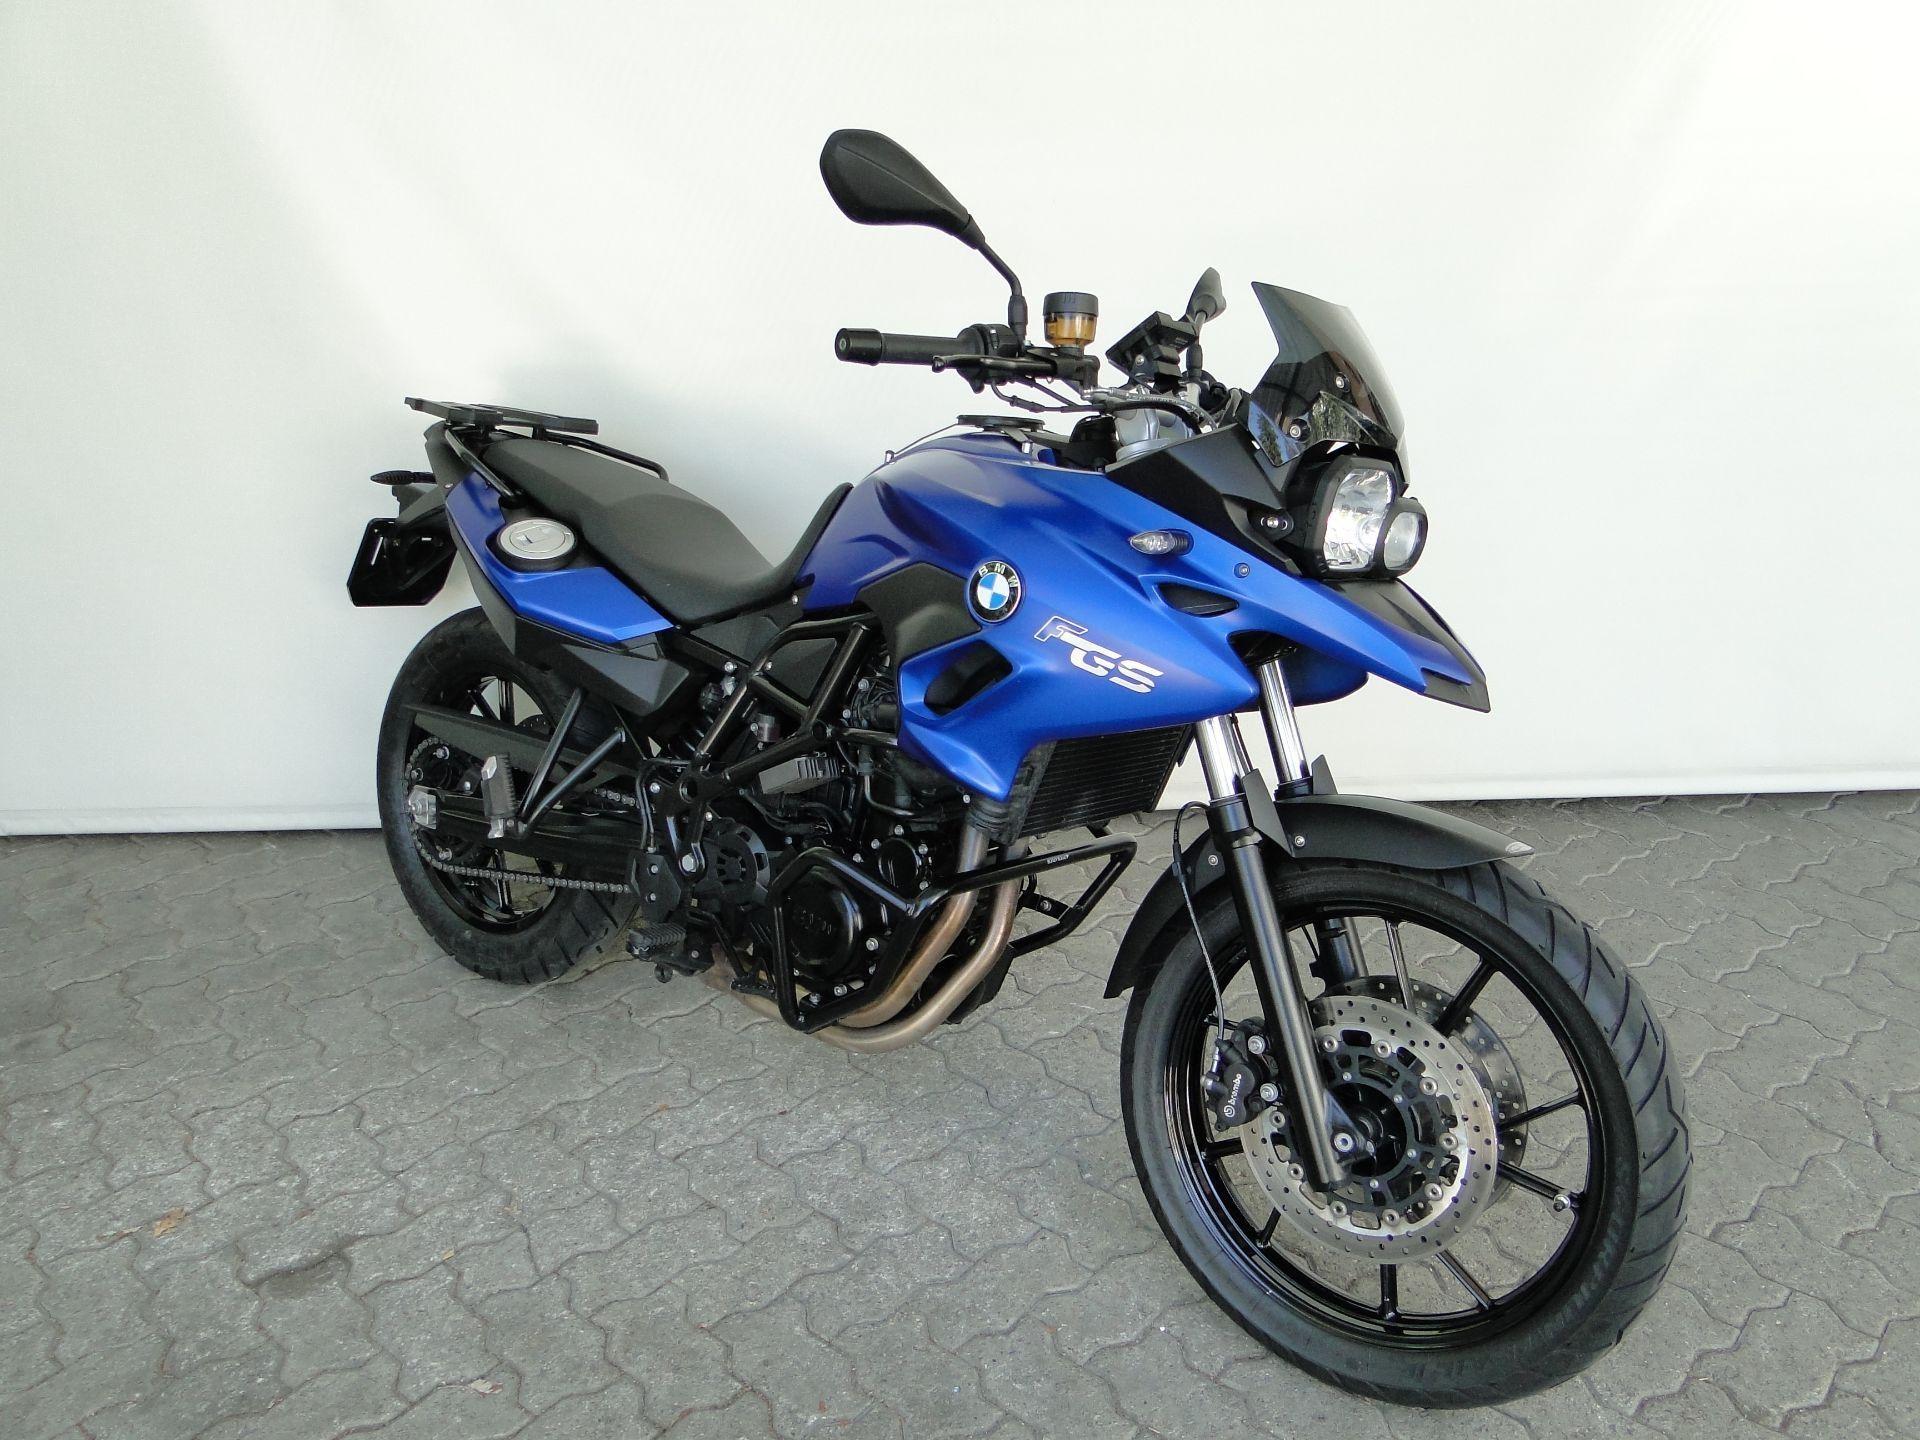 motorrad occasion kaufen bmw f 700 gs abs tieferlegung hobi moto ag winterthur. Black Bedroom Furniture Sets. Home Design Ideas